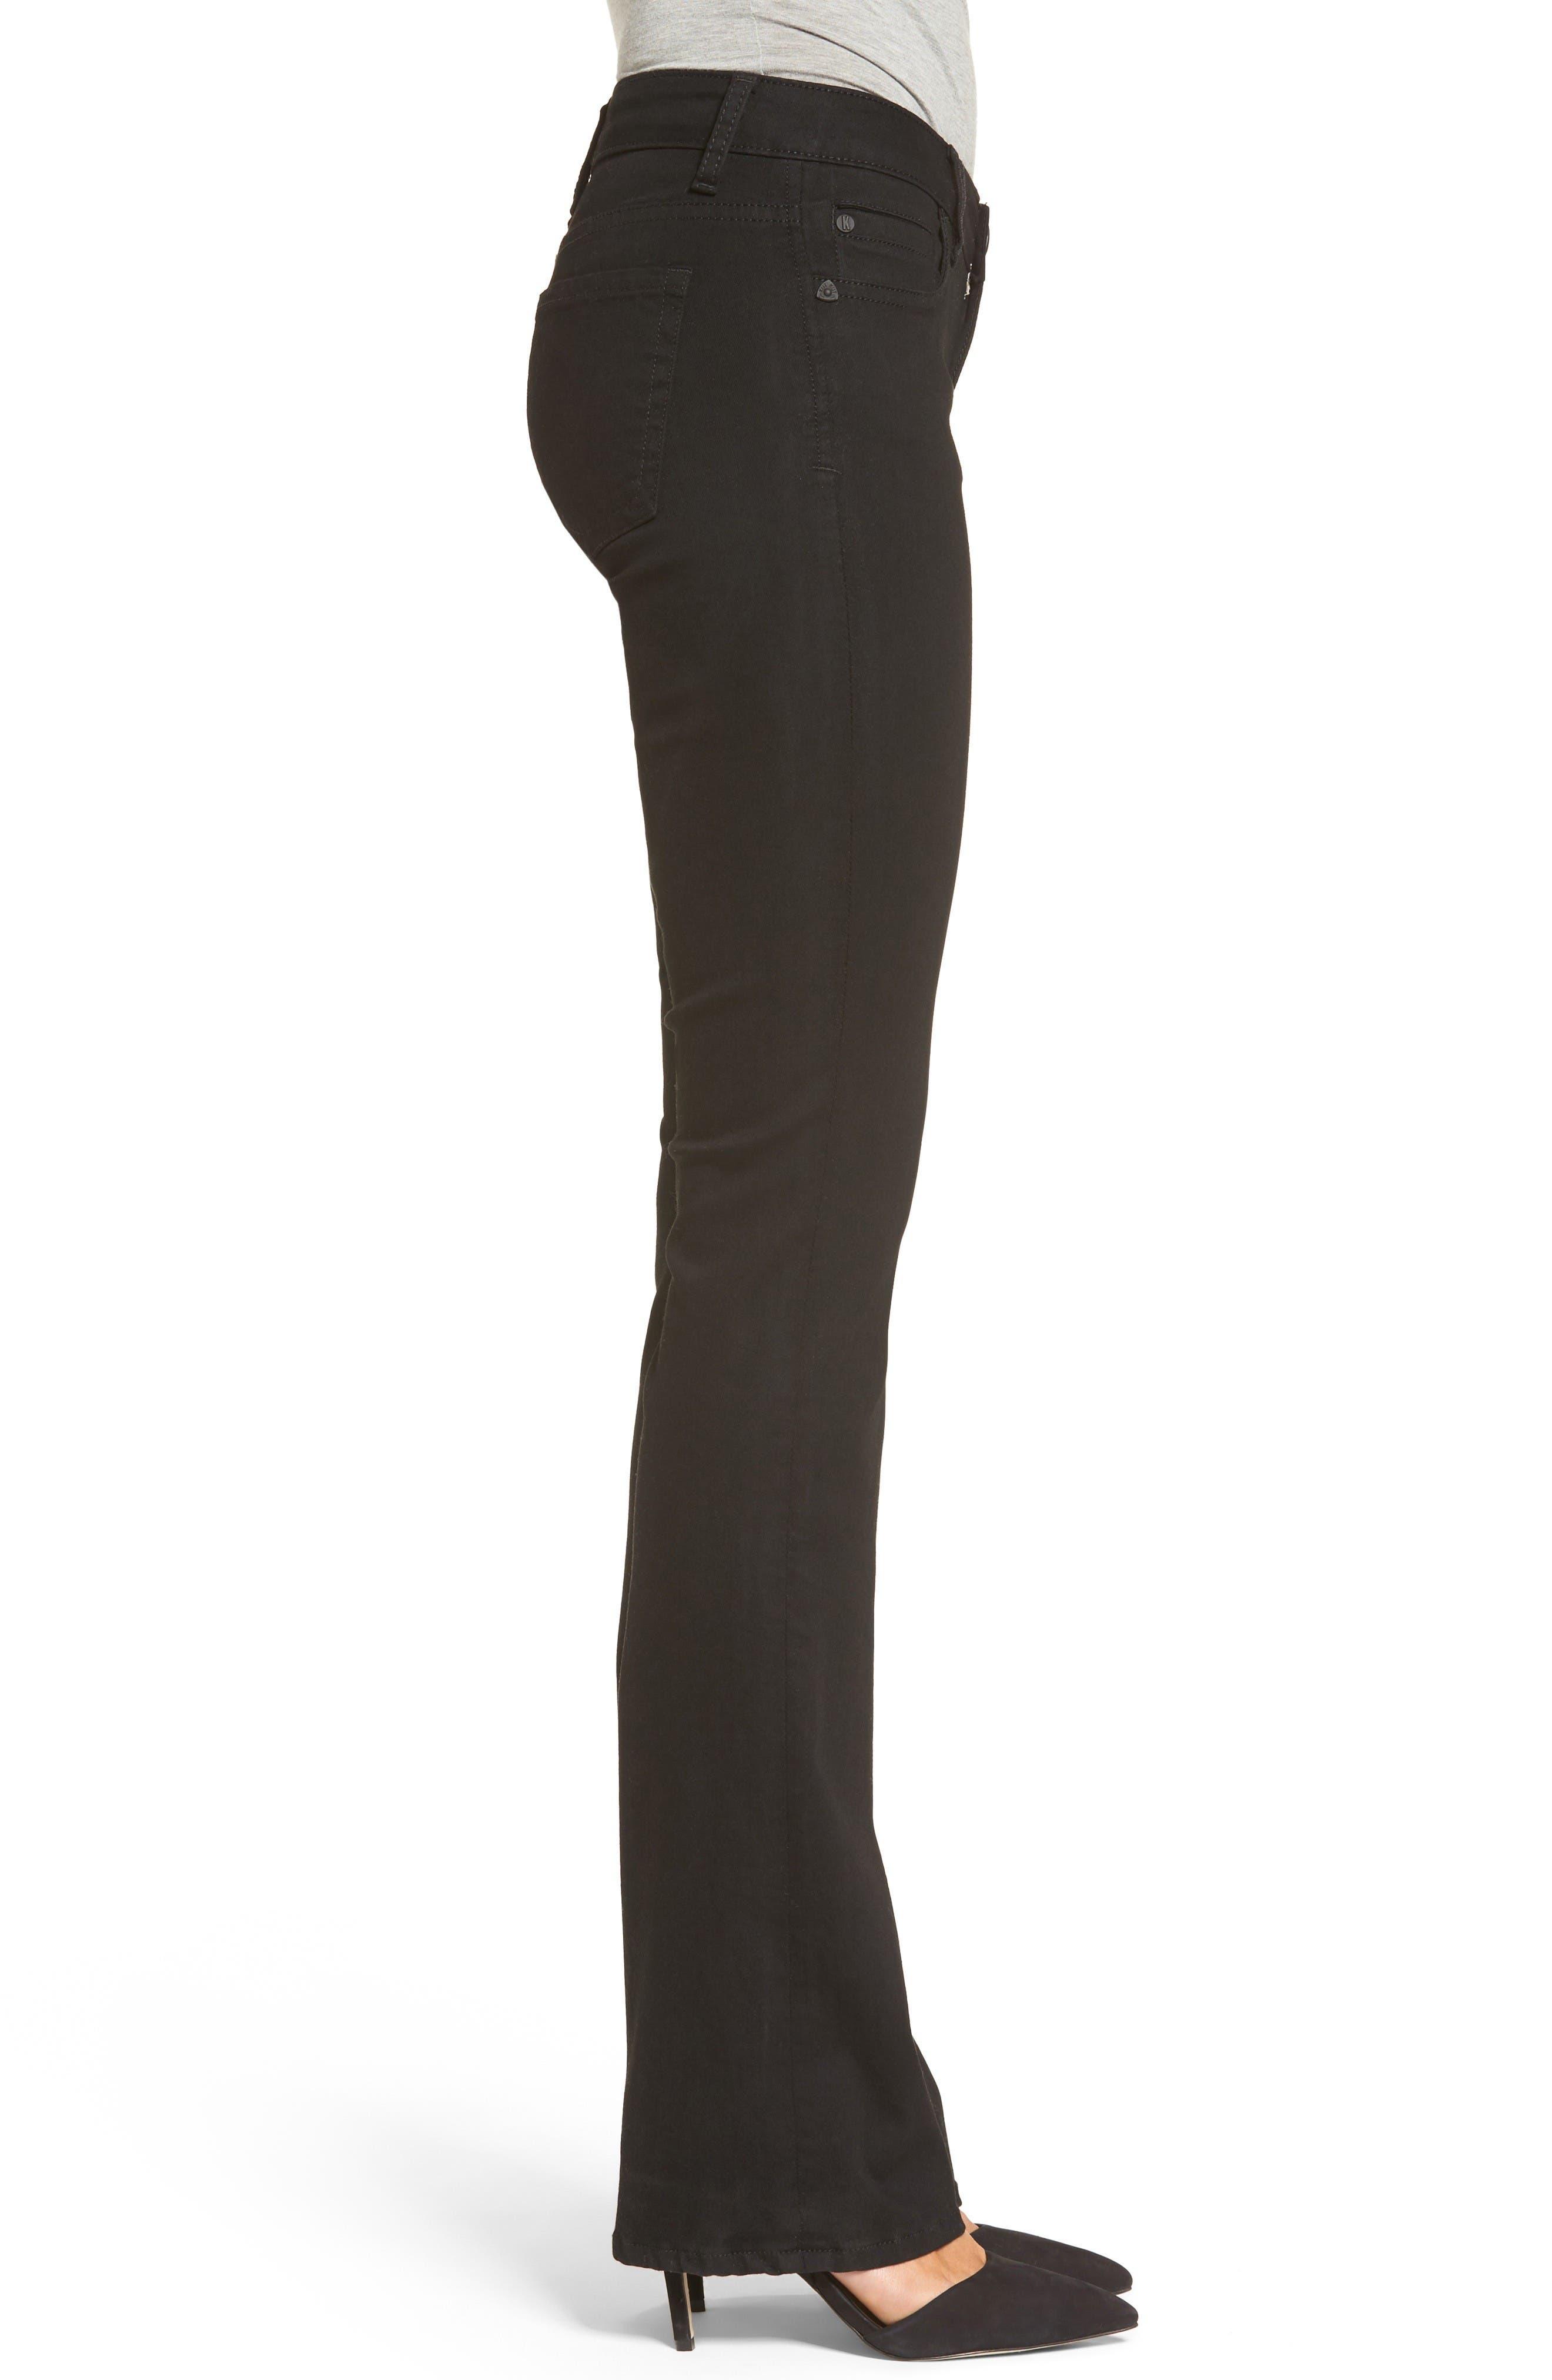 Alternate Image 3  - KUT from the Kloth Natalie Stretch Bootleg Jeans (Regular & Petite)